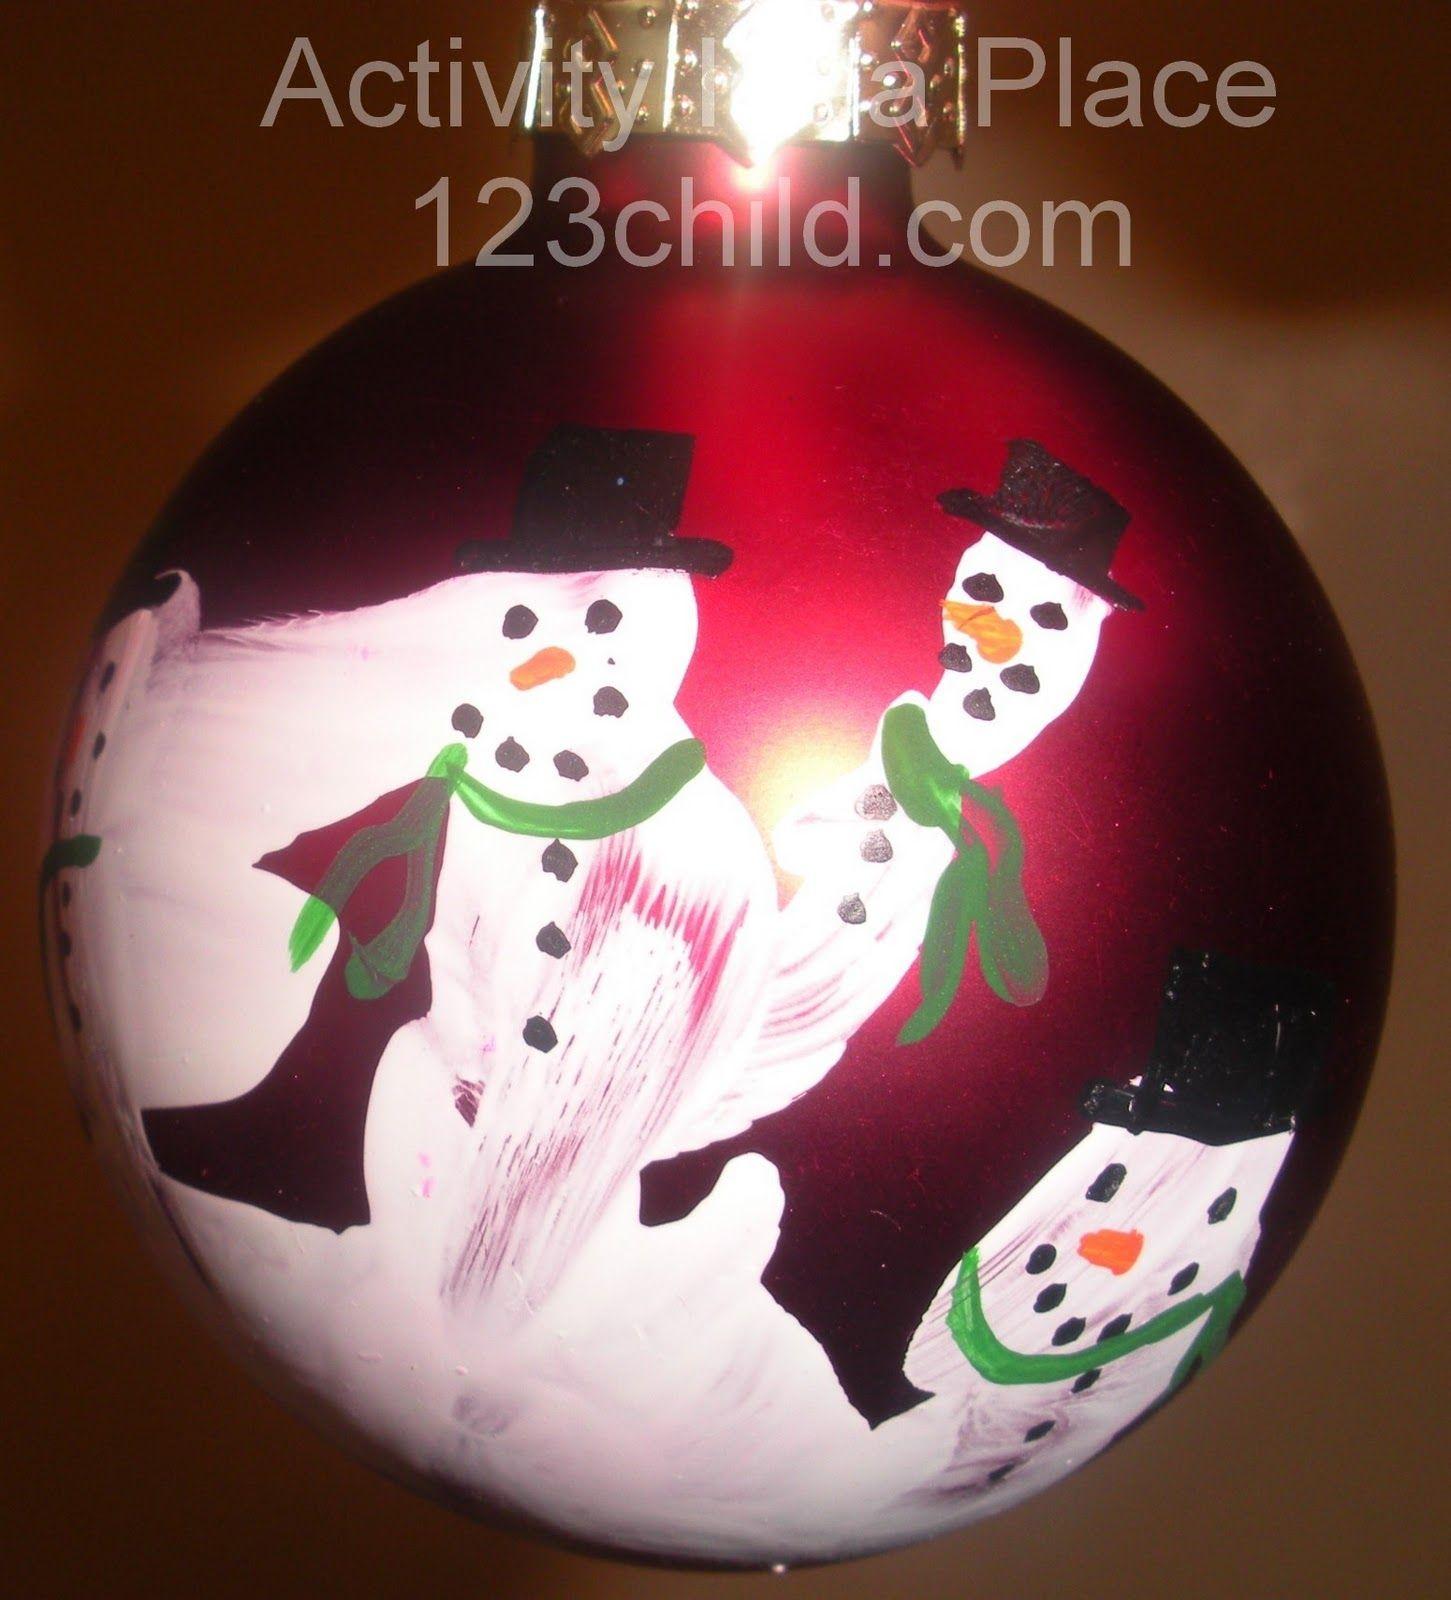 Snowman Hand Print Ornament Handprint Ornaments Christmas Homemade Christmas